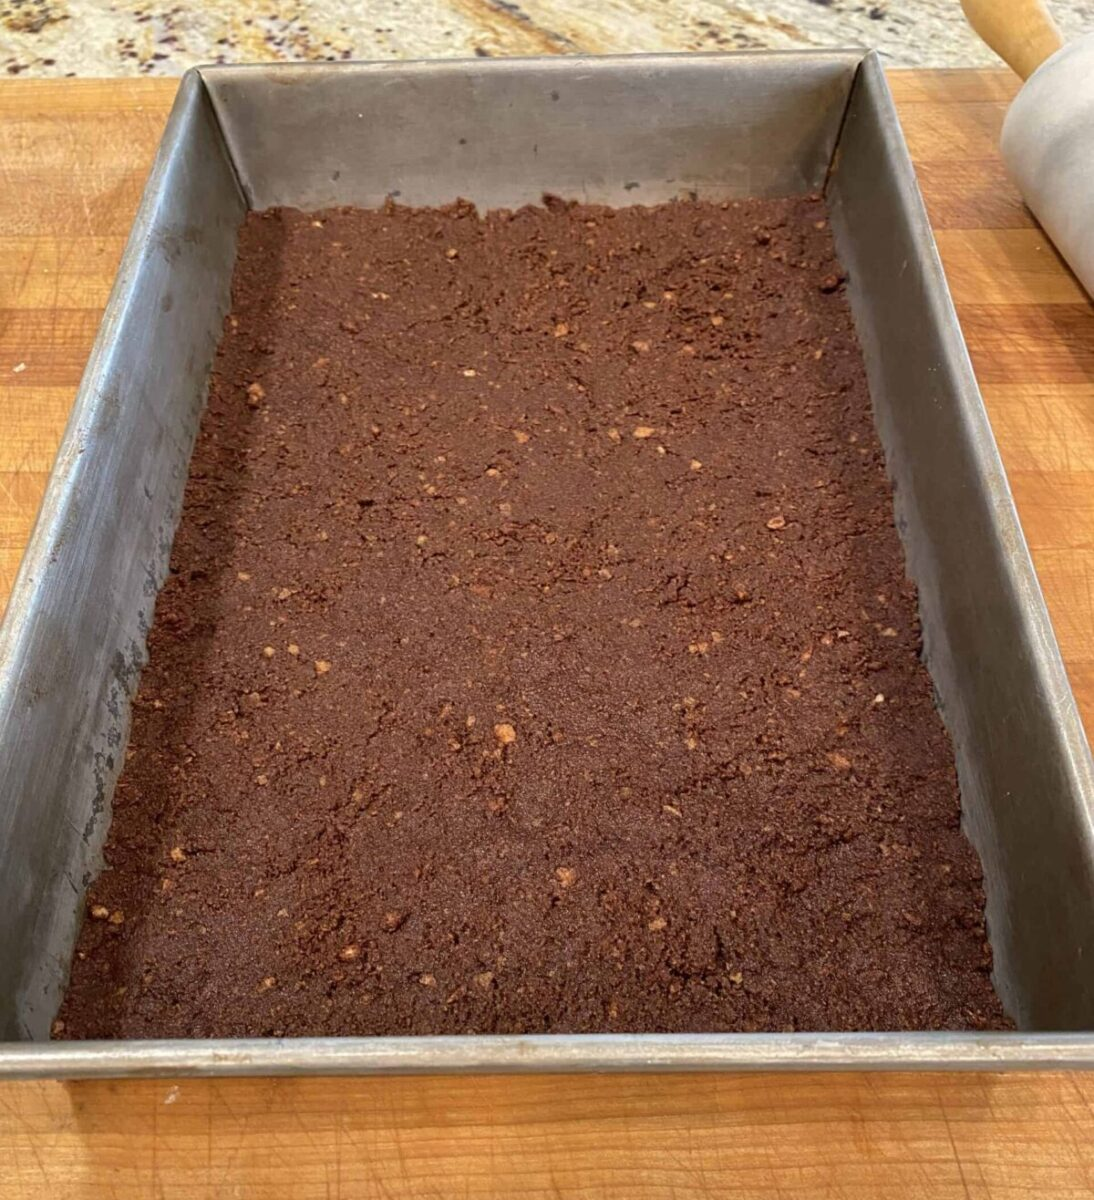 Chocolate vanilla wafer crust in a baking pan.